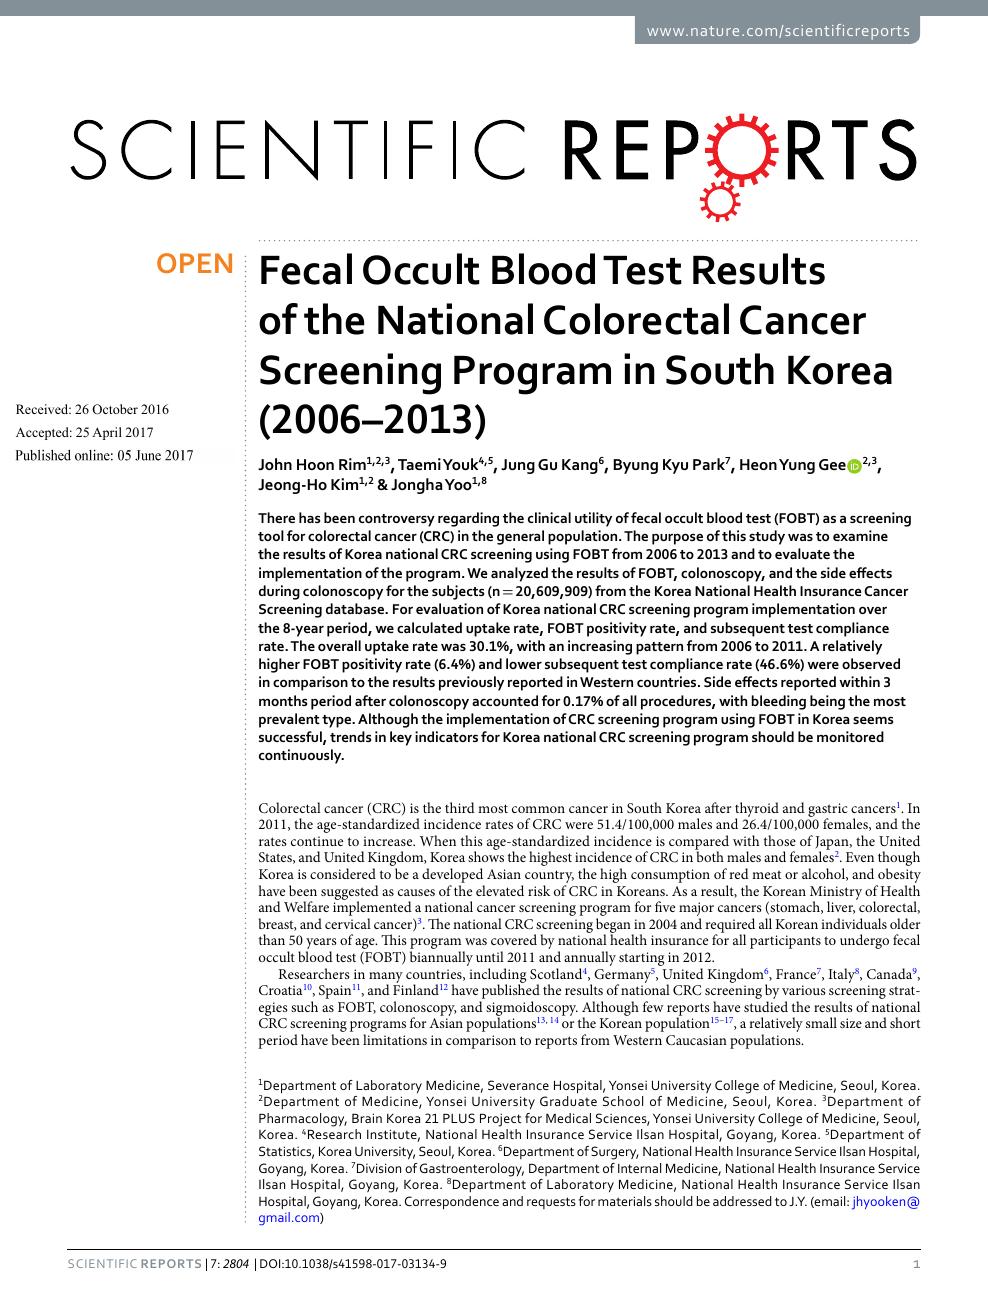 colorectal cancer korean